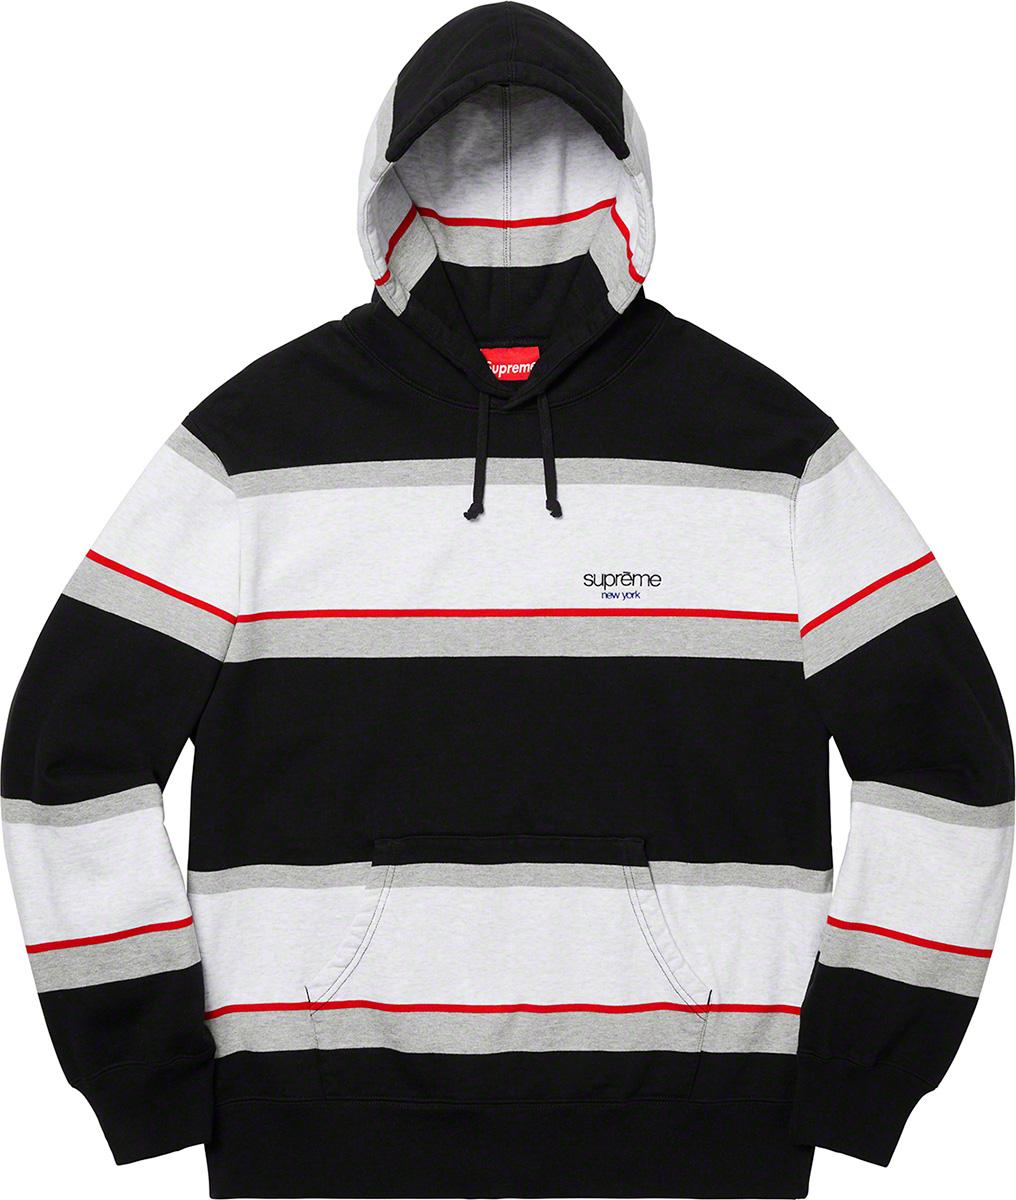 supreme-19aw-19fw-fall-winter-stripe-hooded-sweatshirt